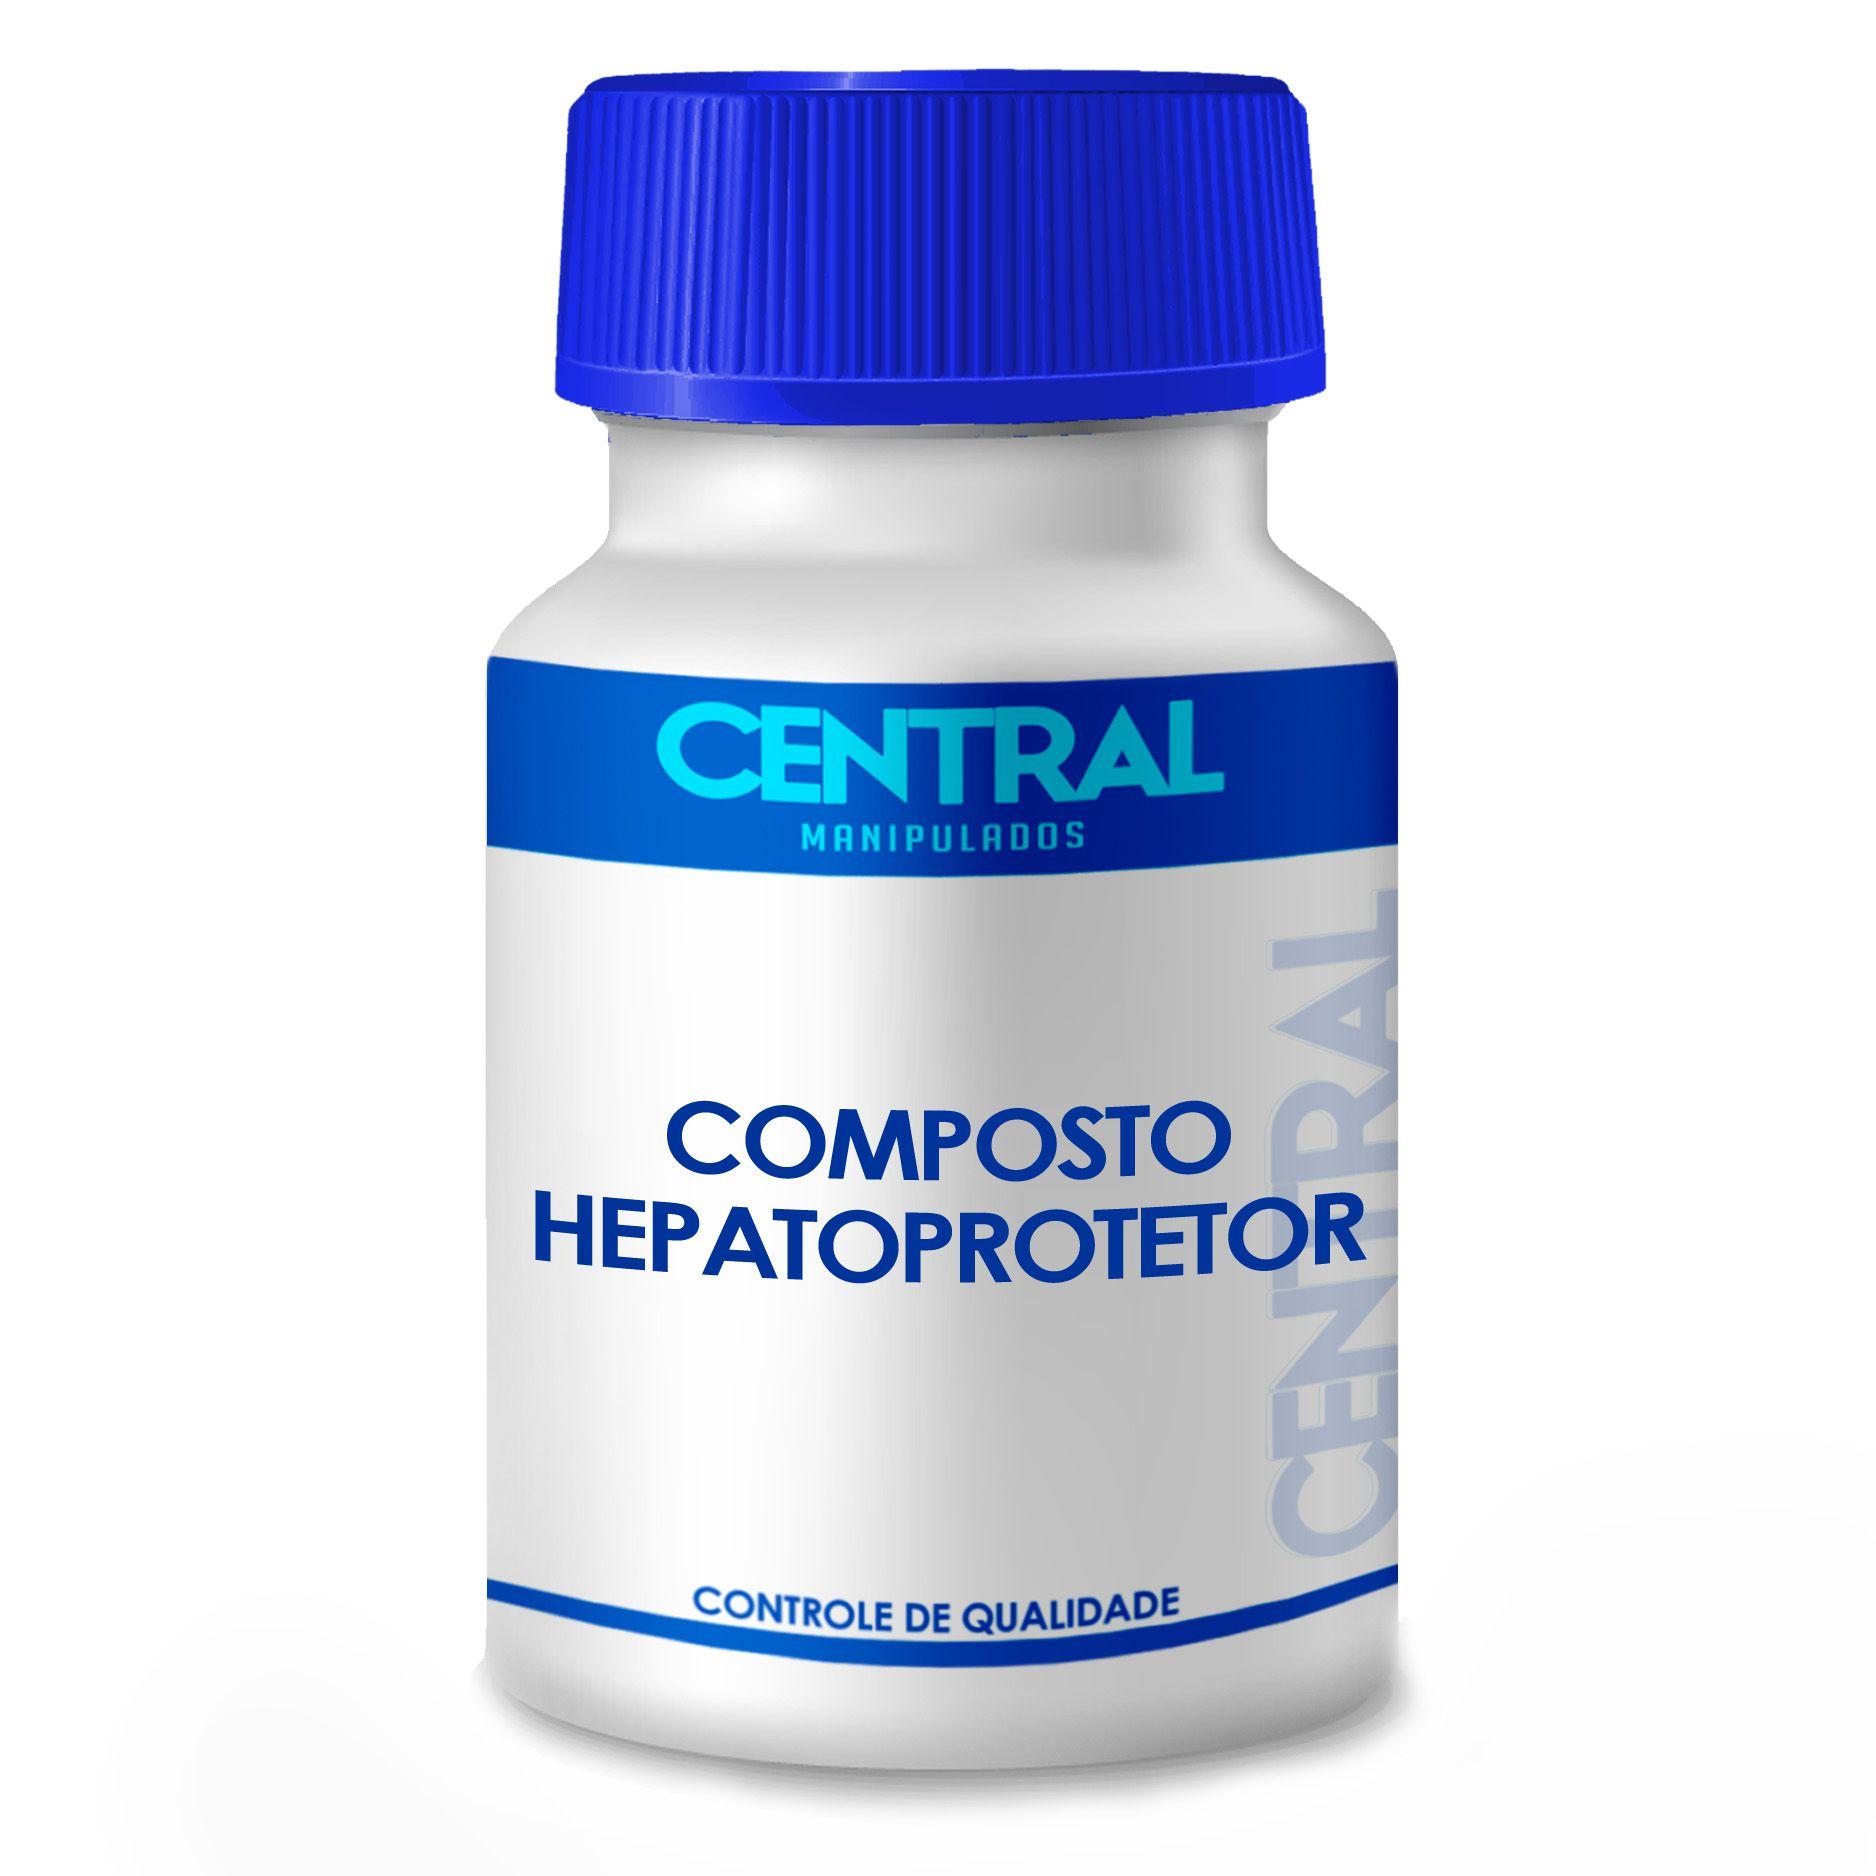 Composto Hepatoprotetor 240 cápsulas